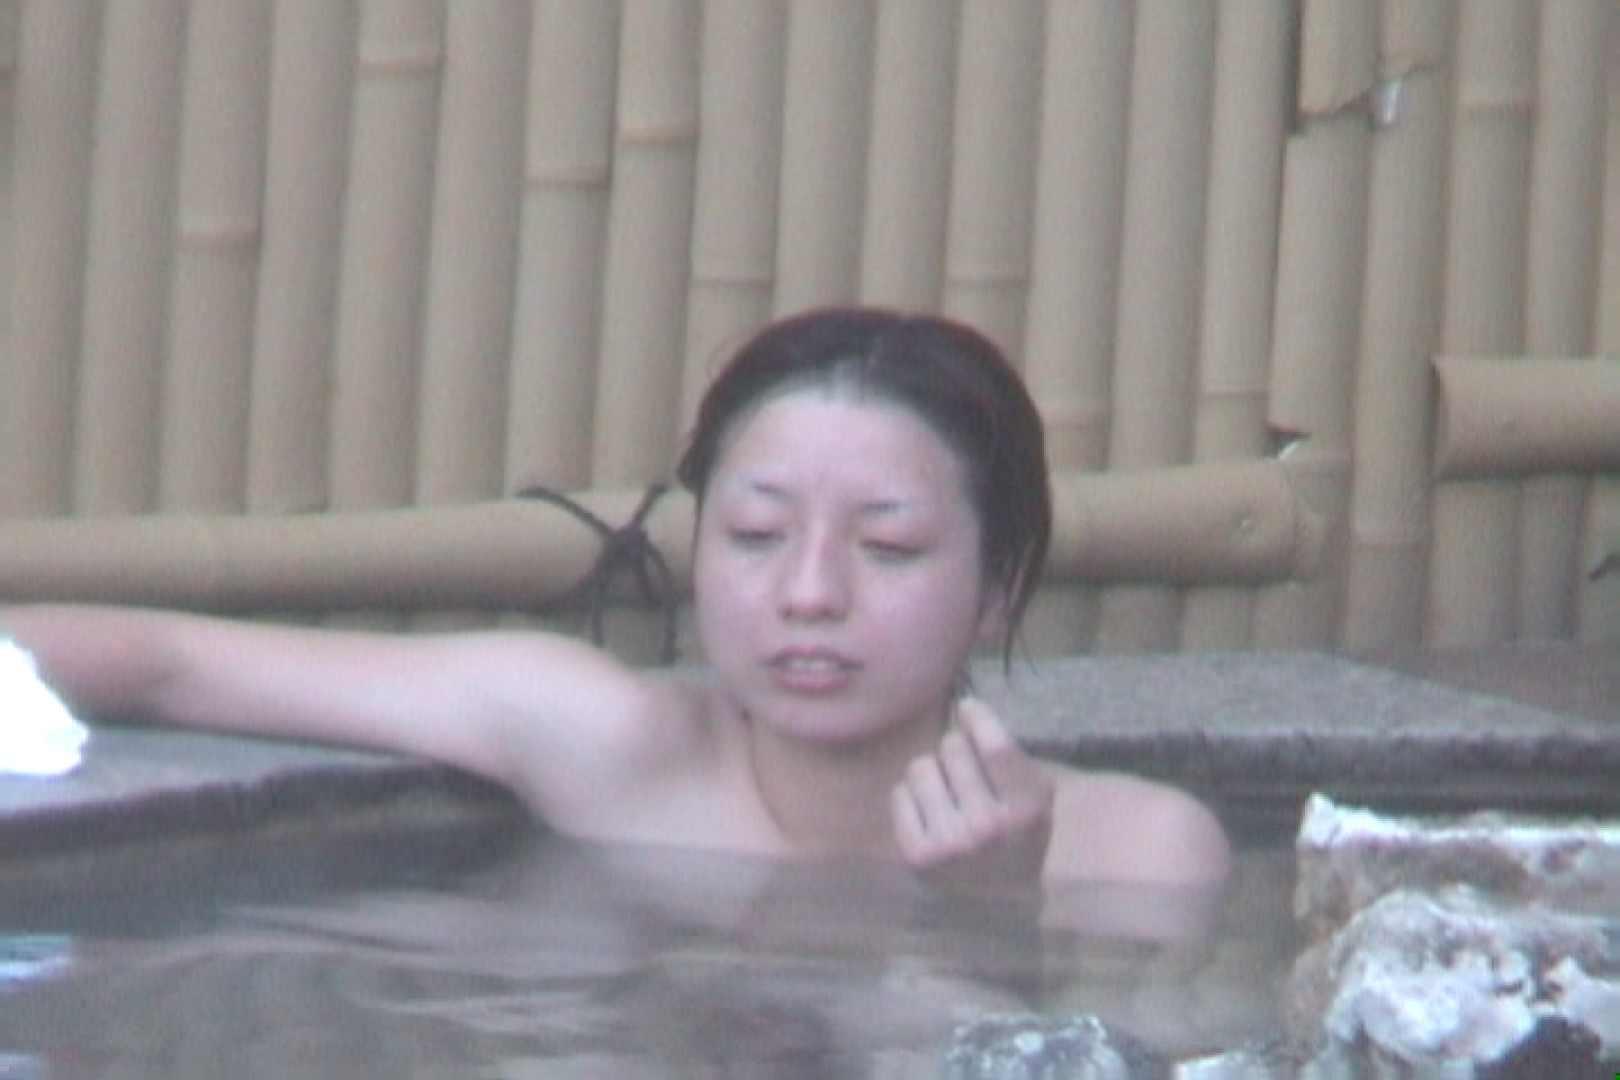 Aquaな露天風呂Vol.608 HなOL | 盗撮  89pic 78